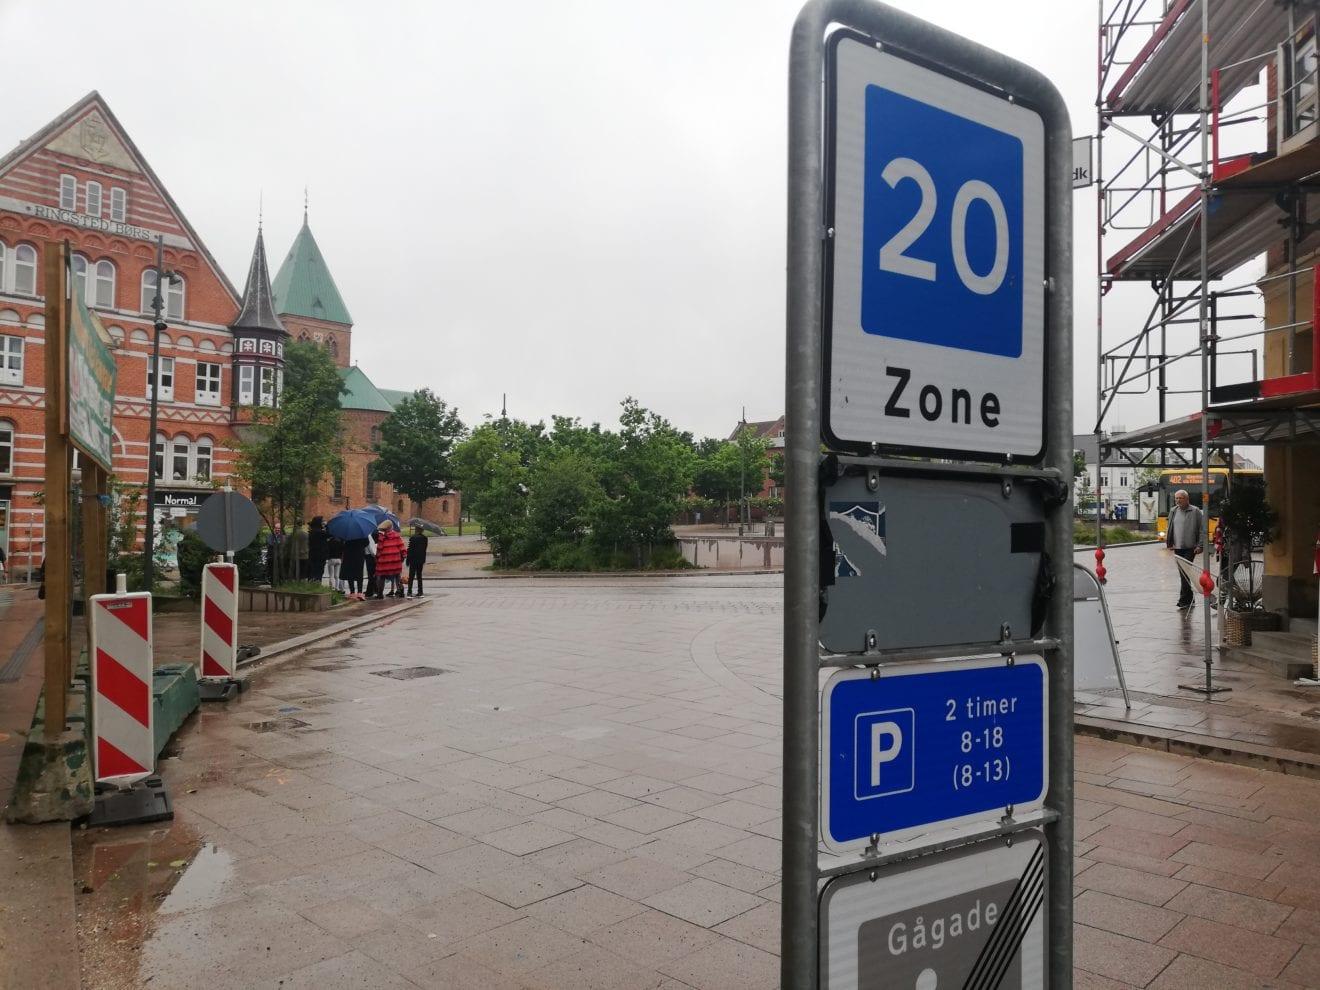 Undgå parkeringsafgift